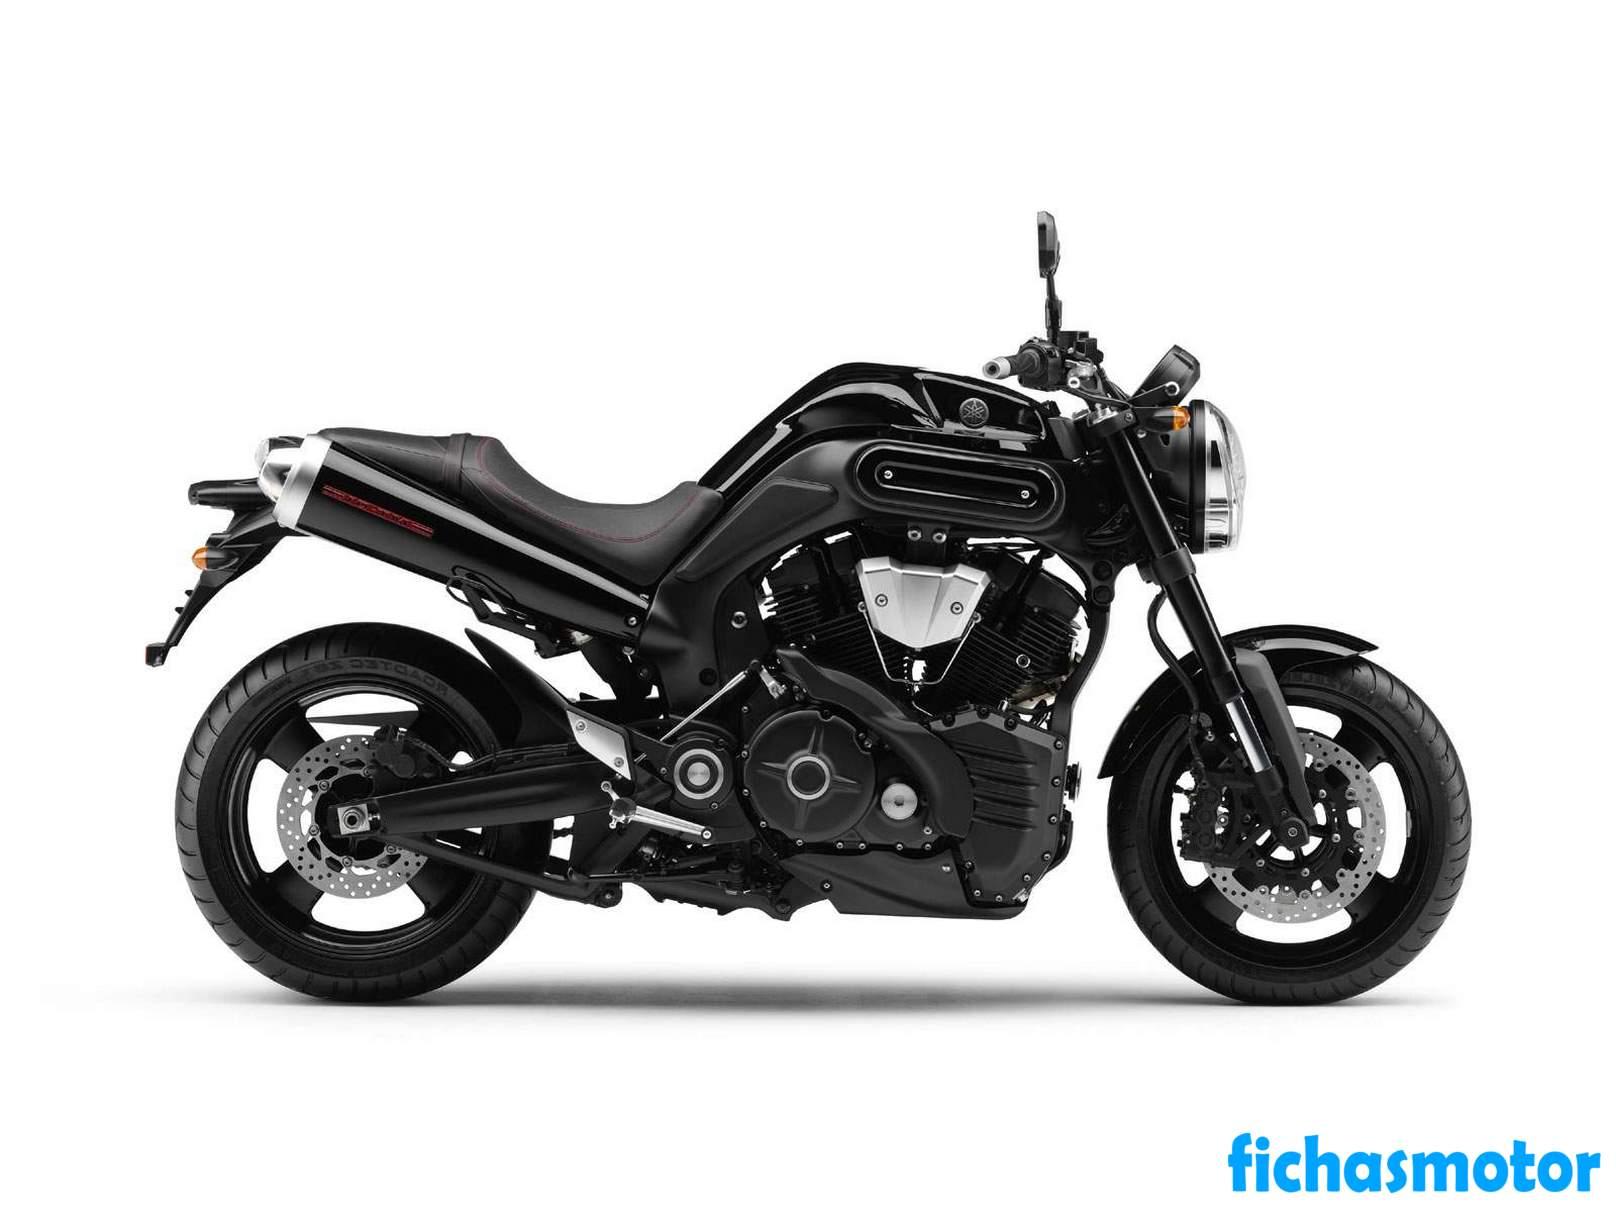 Ficha técnica Yamaha mt-01 2011